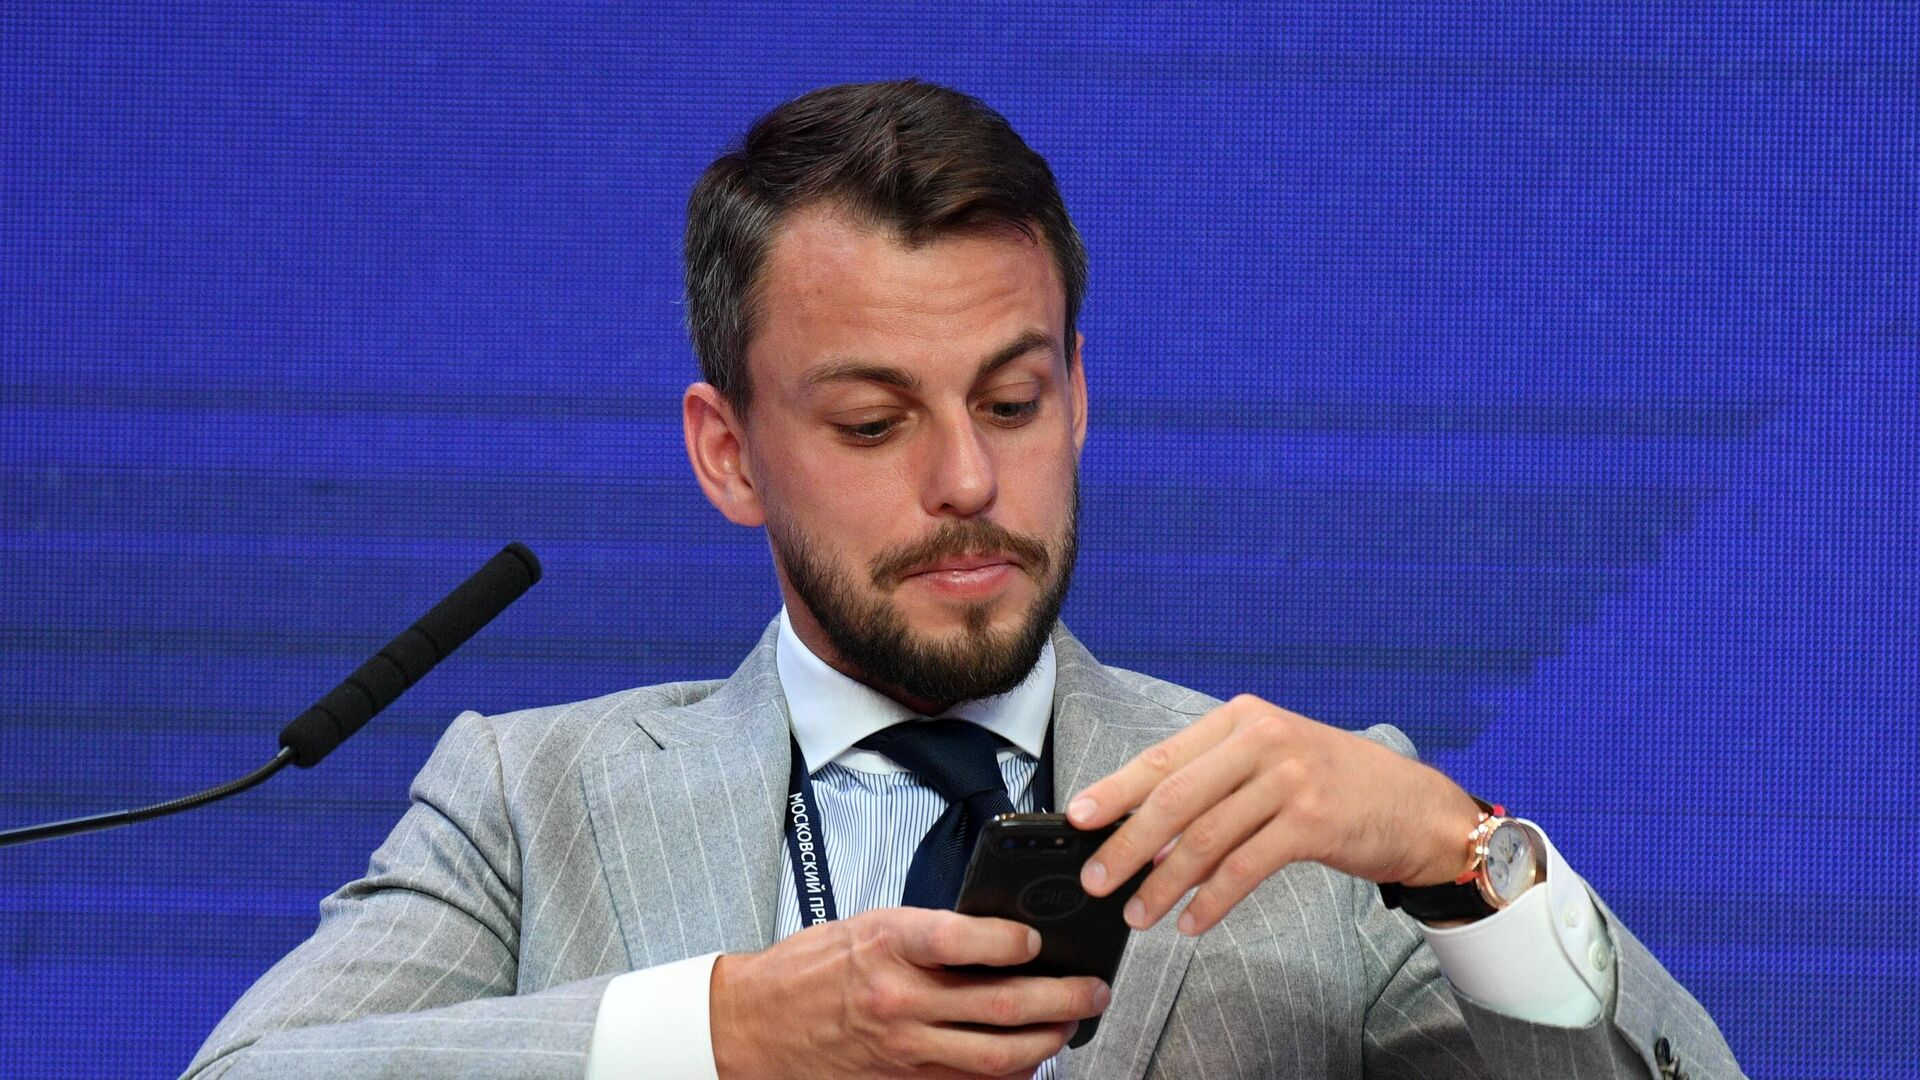 Защита основателя Group-IB Сачкова обжаловала его арест